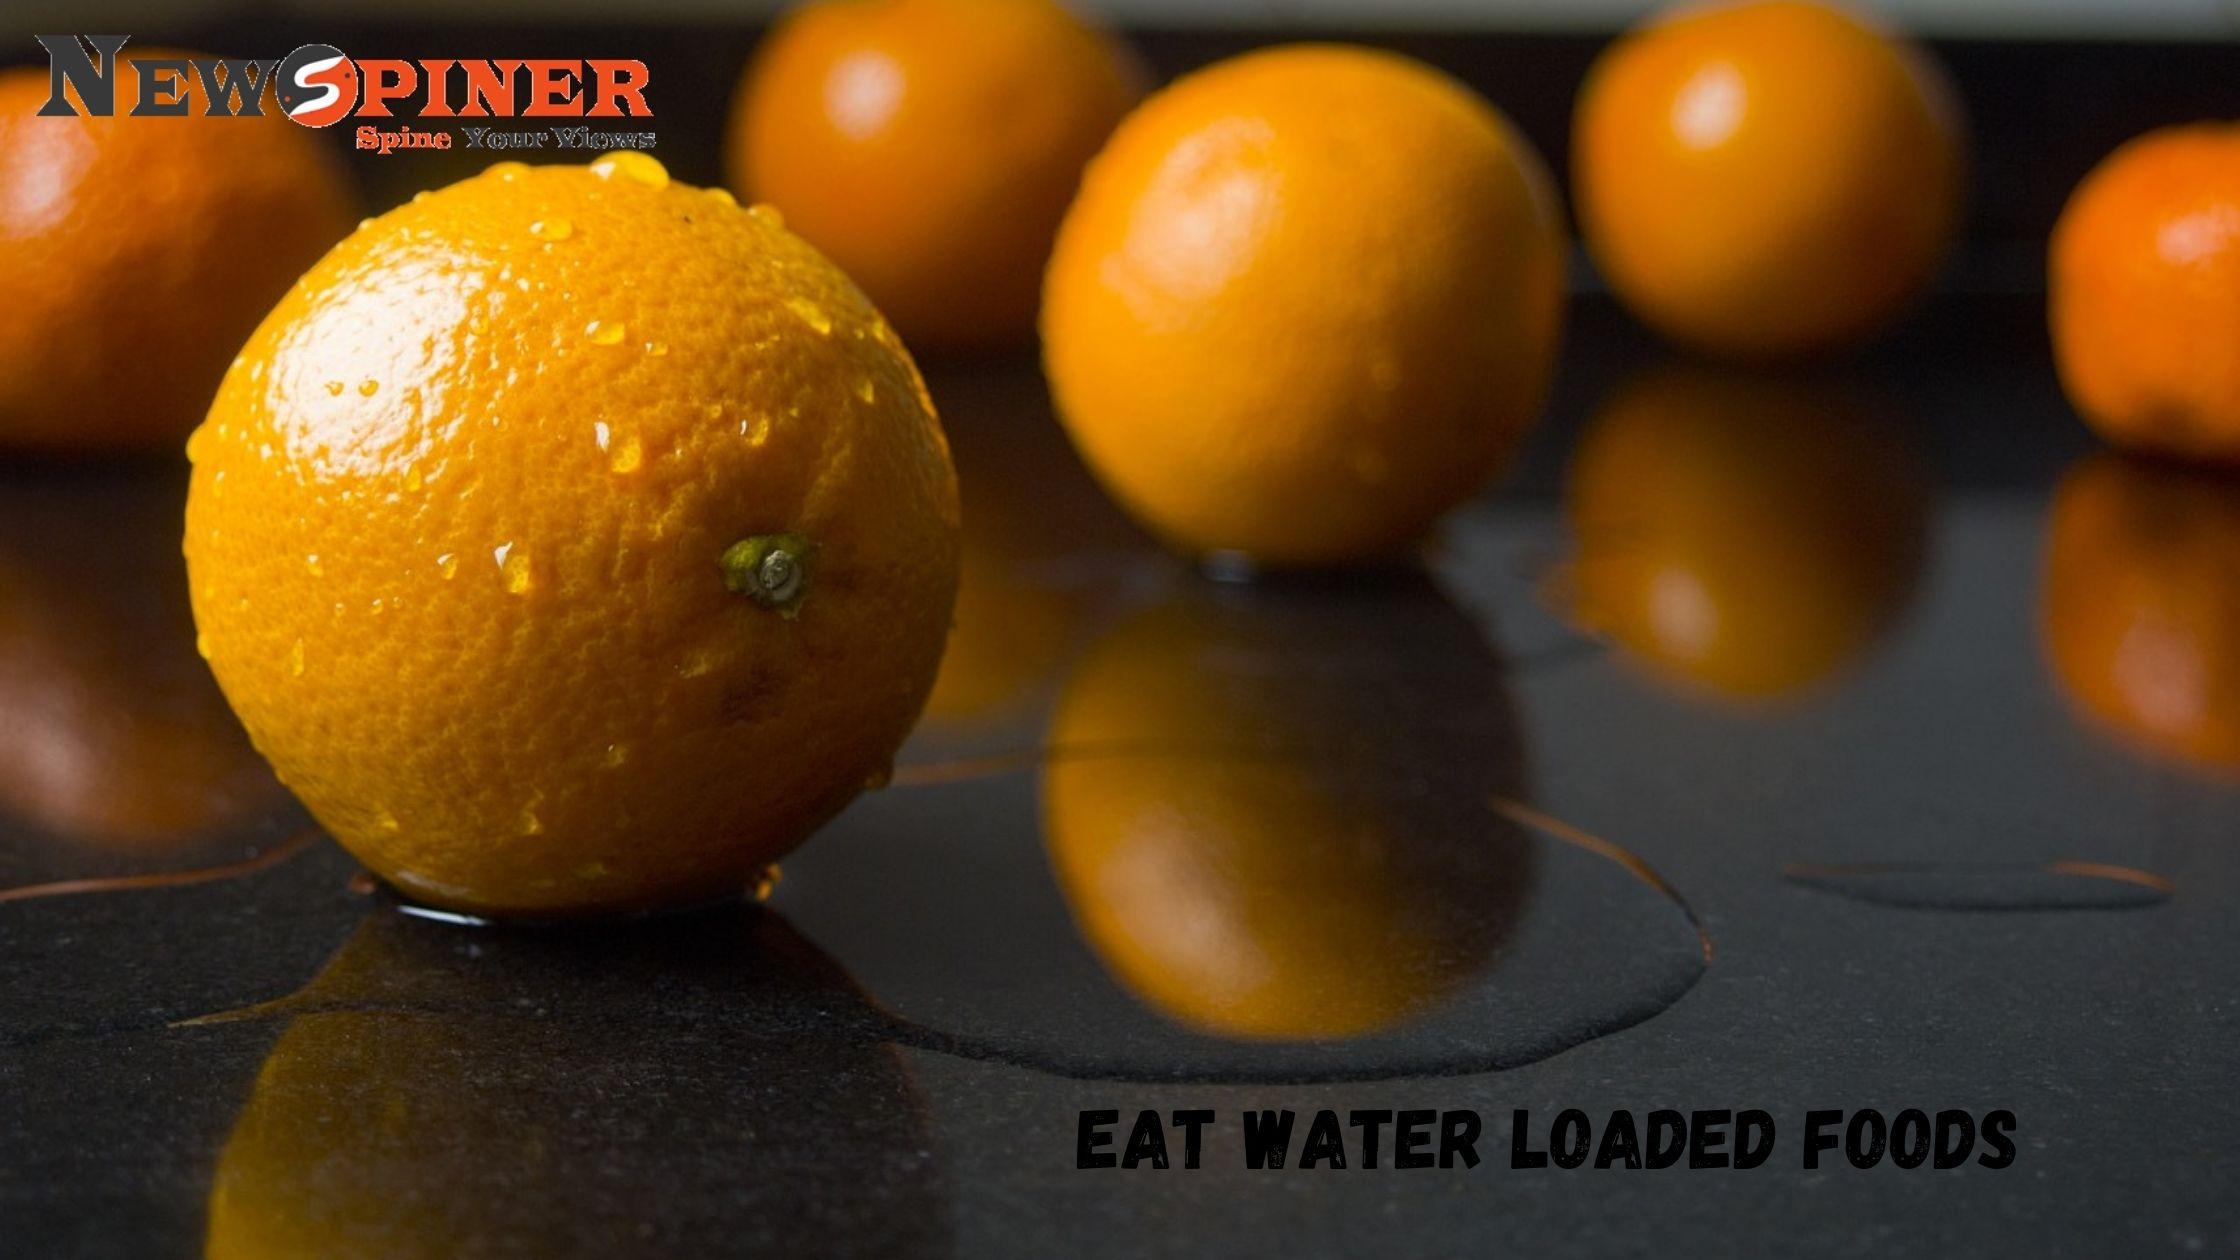 Eat Water Loaded Food